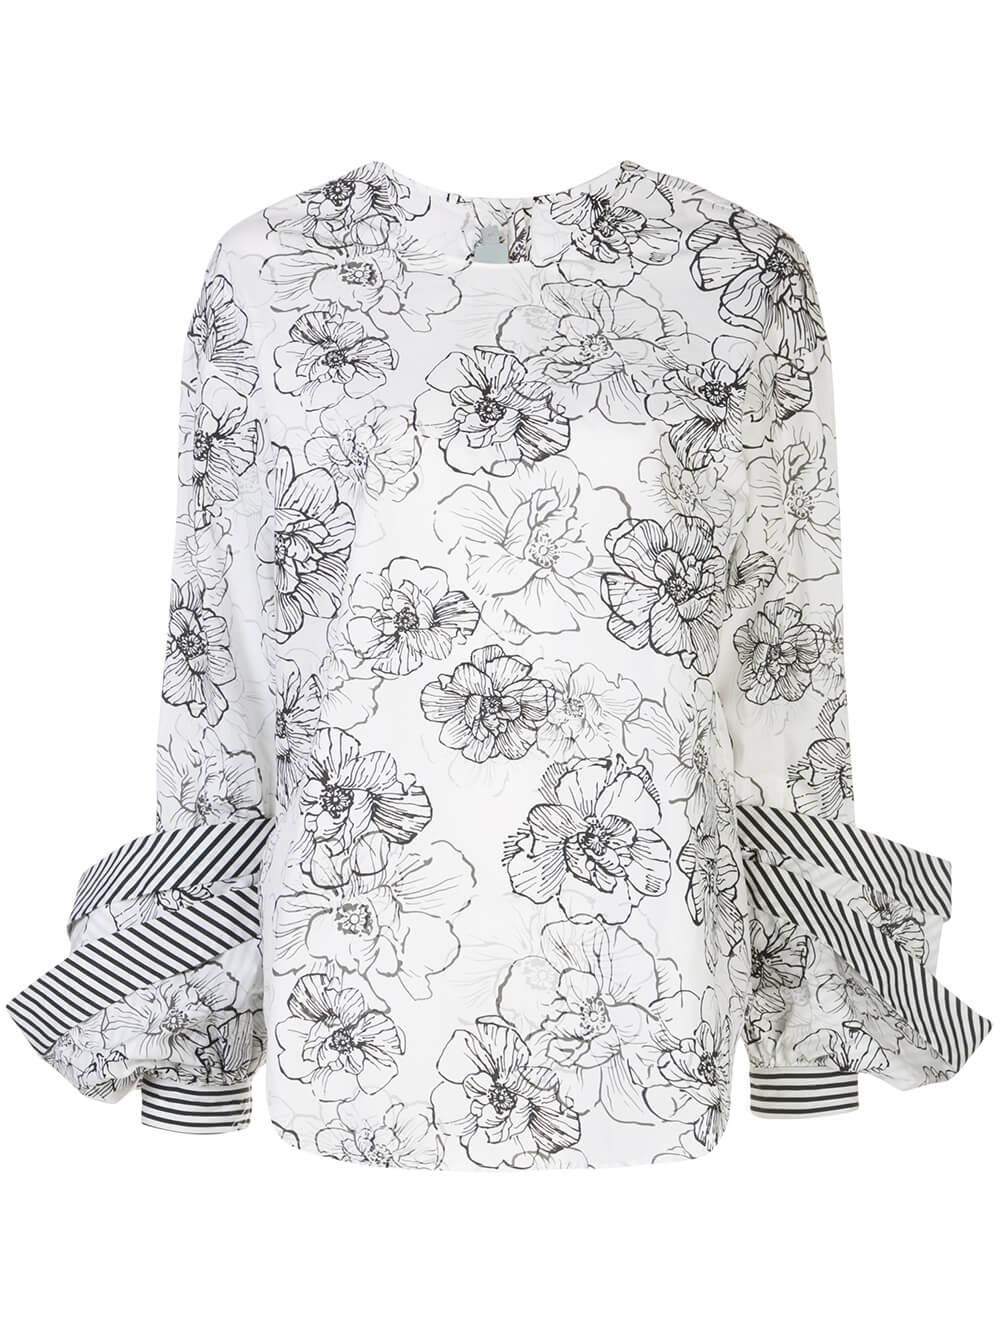 Jessica Floral Print Cotton Blouse Item # JESSICA-BLOUSE